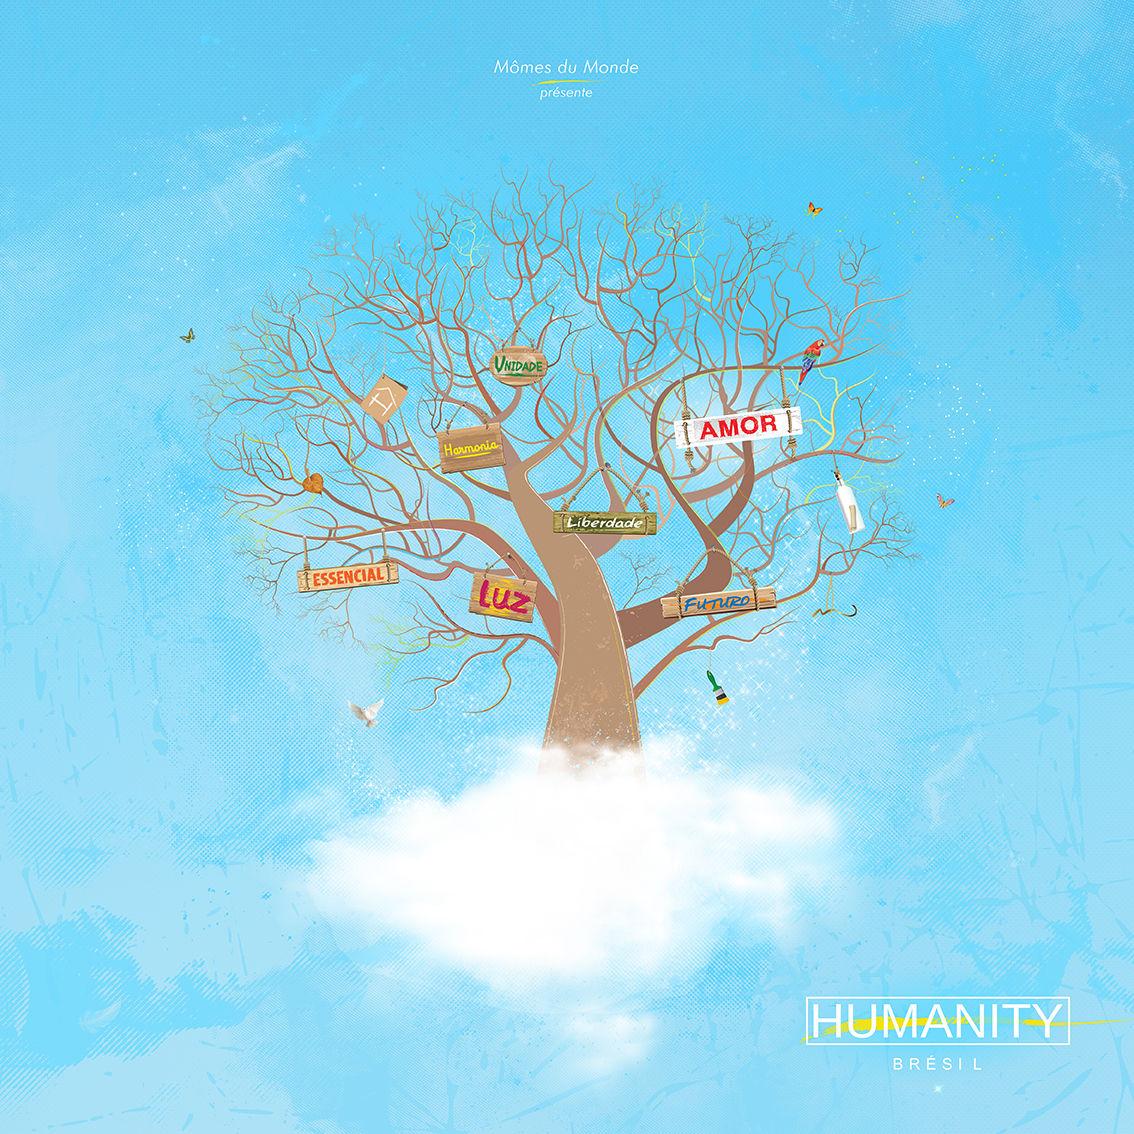 Humanity - Mômes du Monde